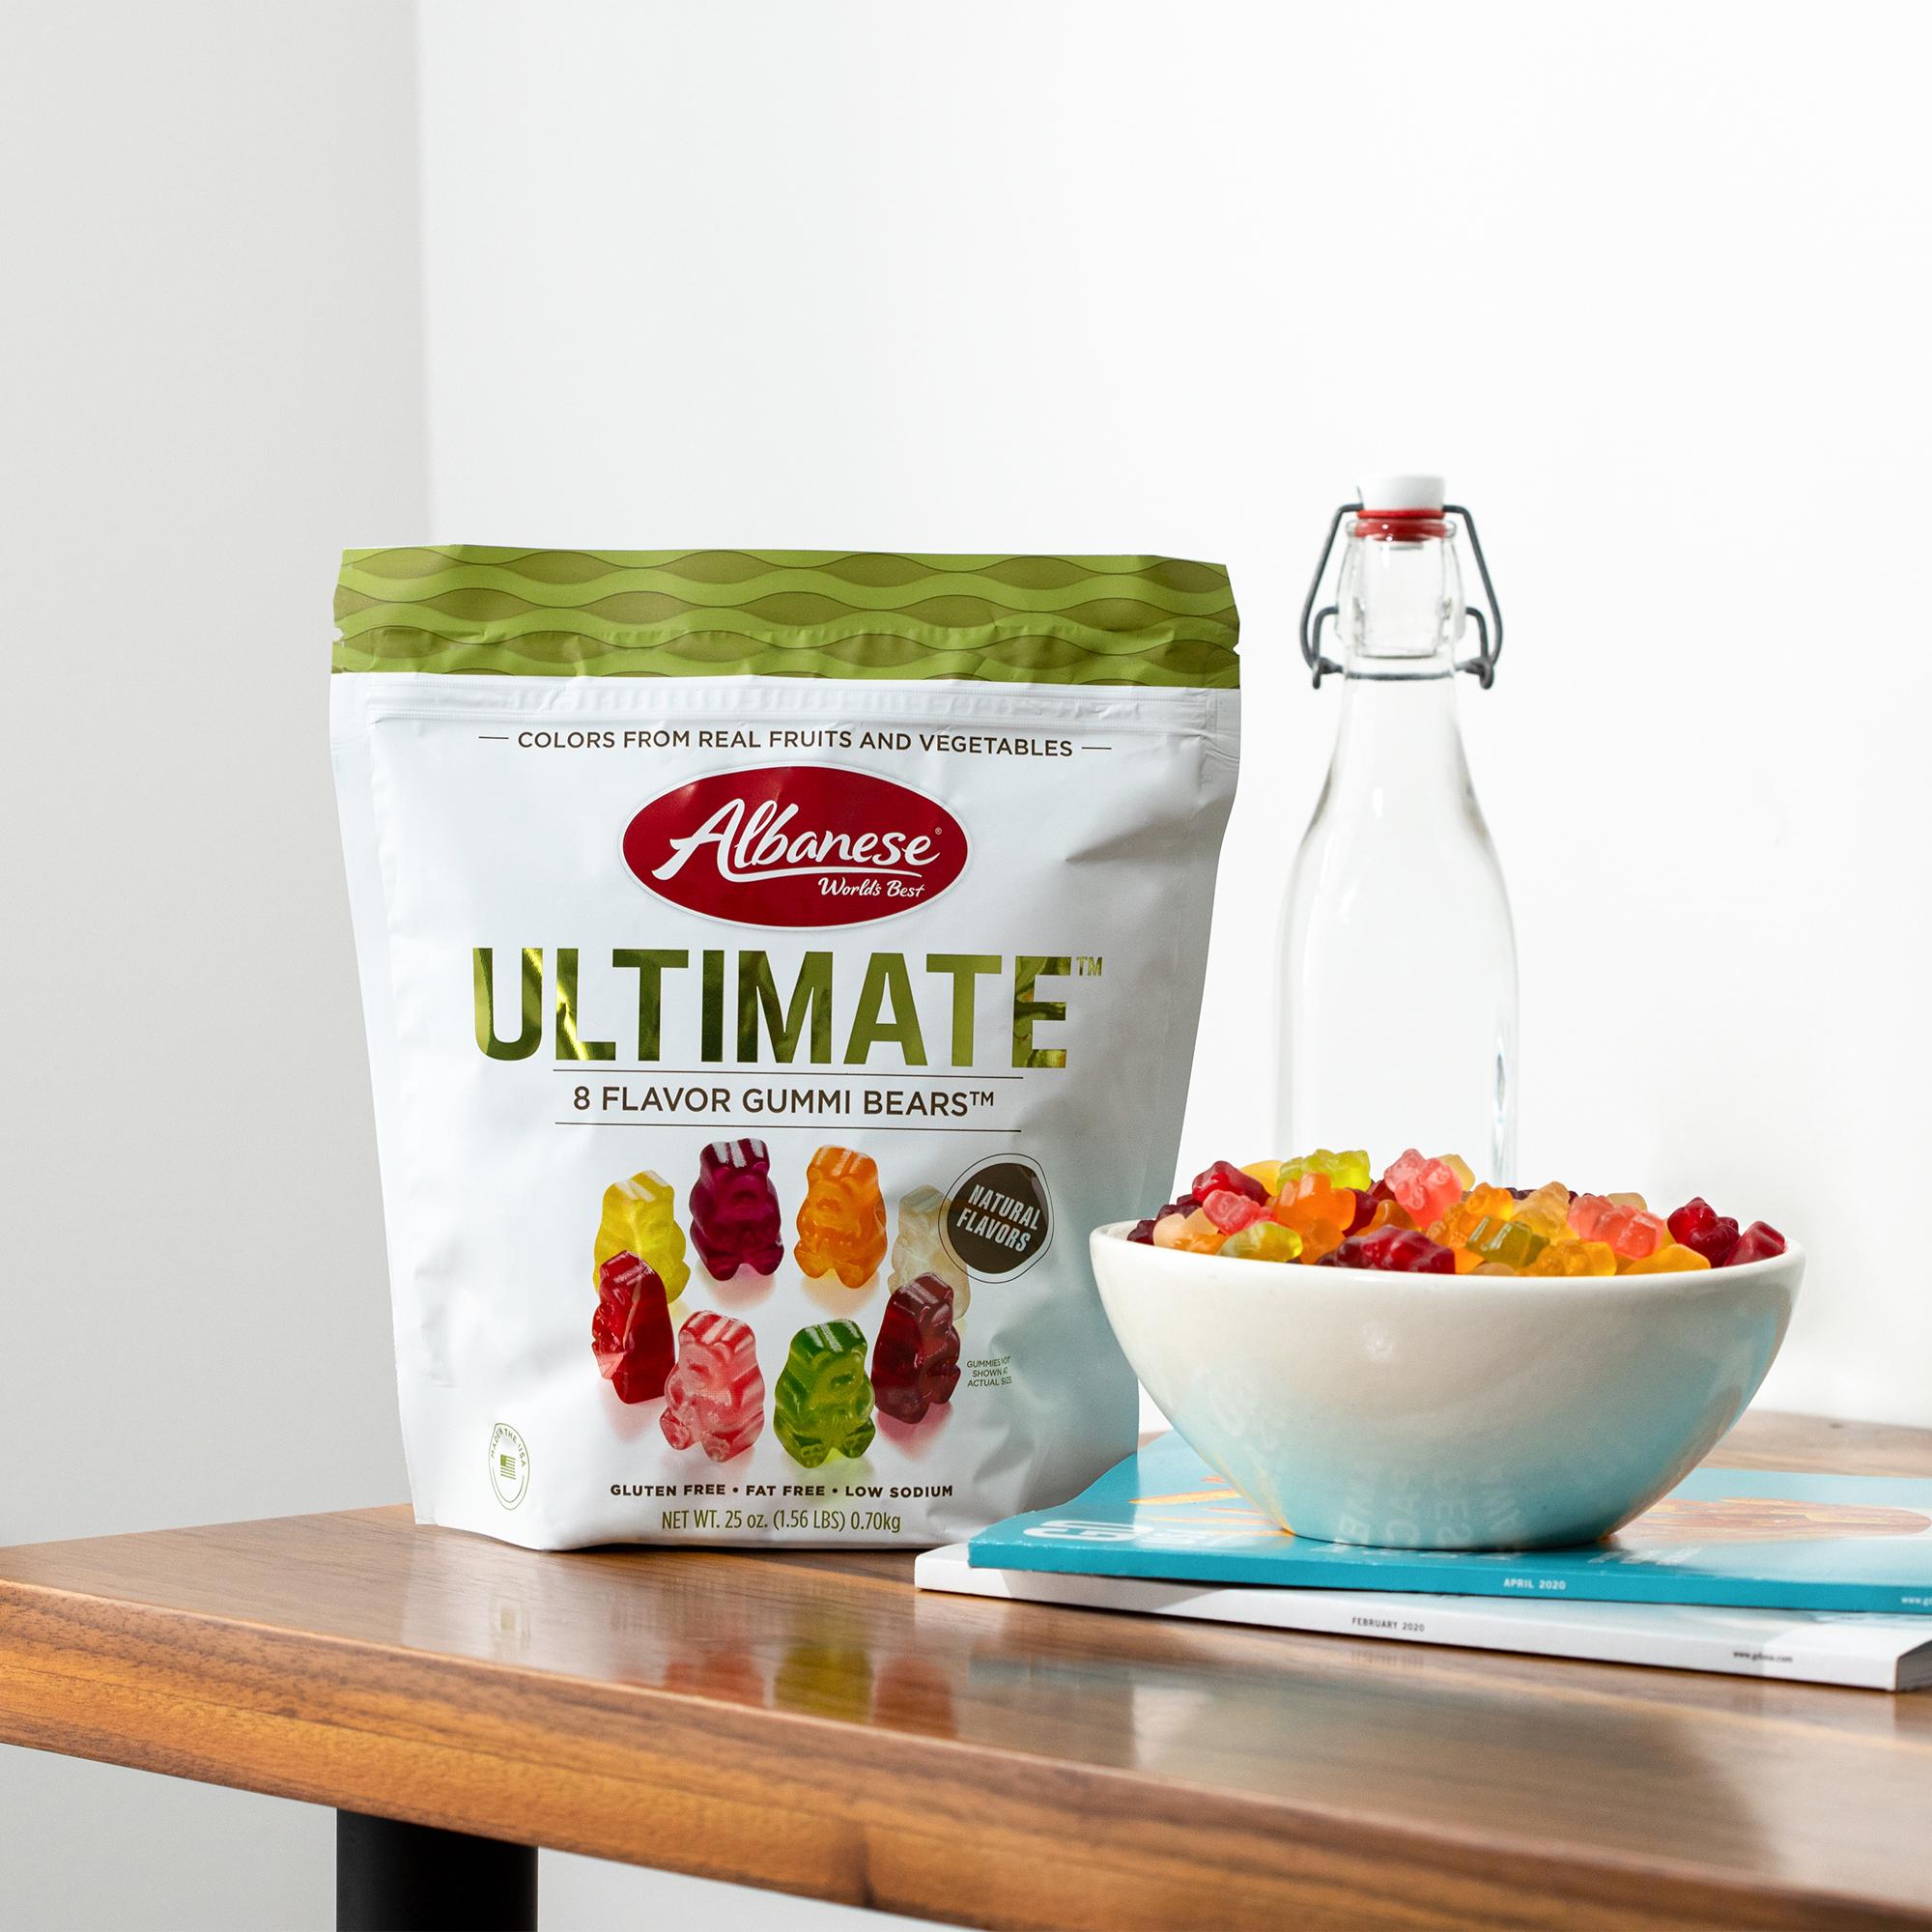 ULTIMATE™ 8 Flavor Gummi Bears™